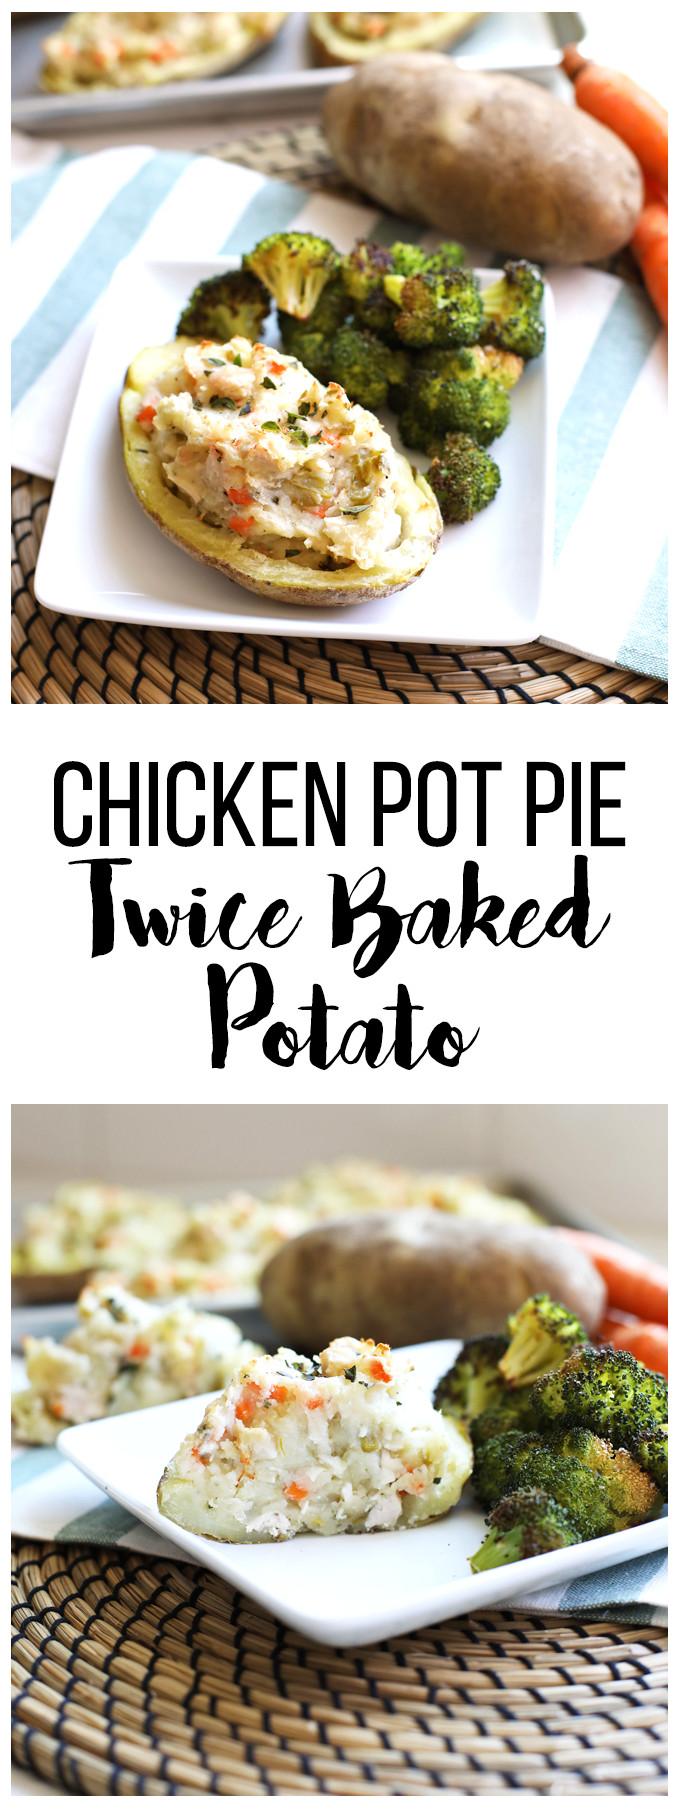 Chicken Pot Pie With Potatoes  Chicken Pot Pie Twice Baked Potatoes – Little Bits of…